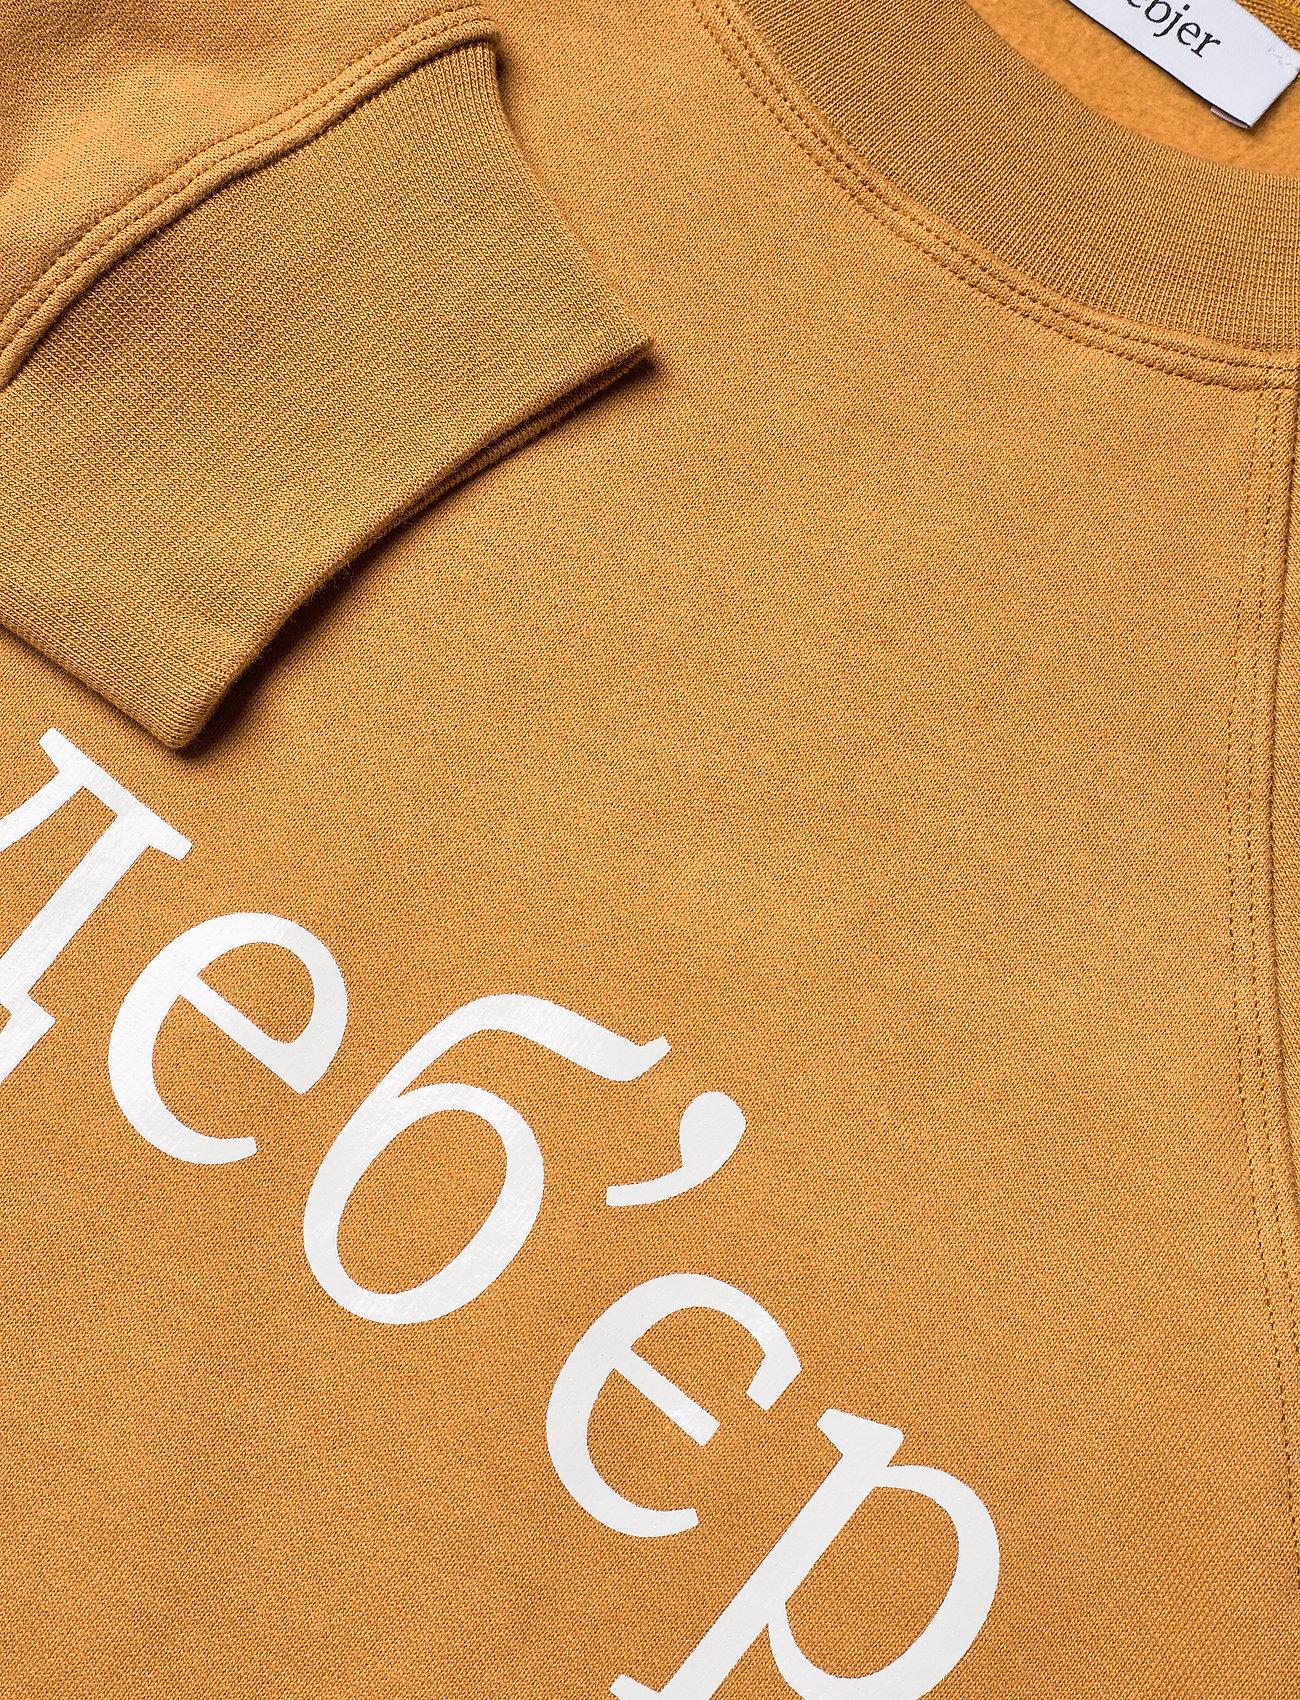 RODEBJER - RODEBJER JALENA - sweatshirts en hoodies - havanna brown - 2